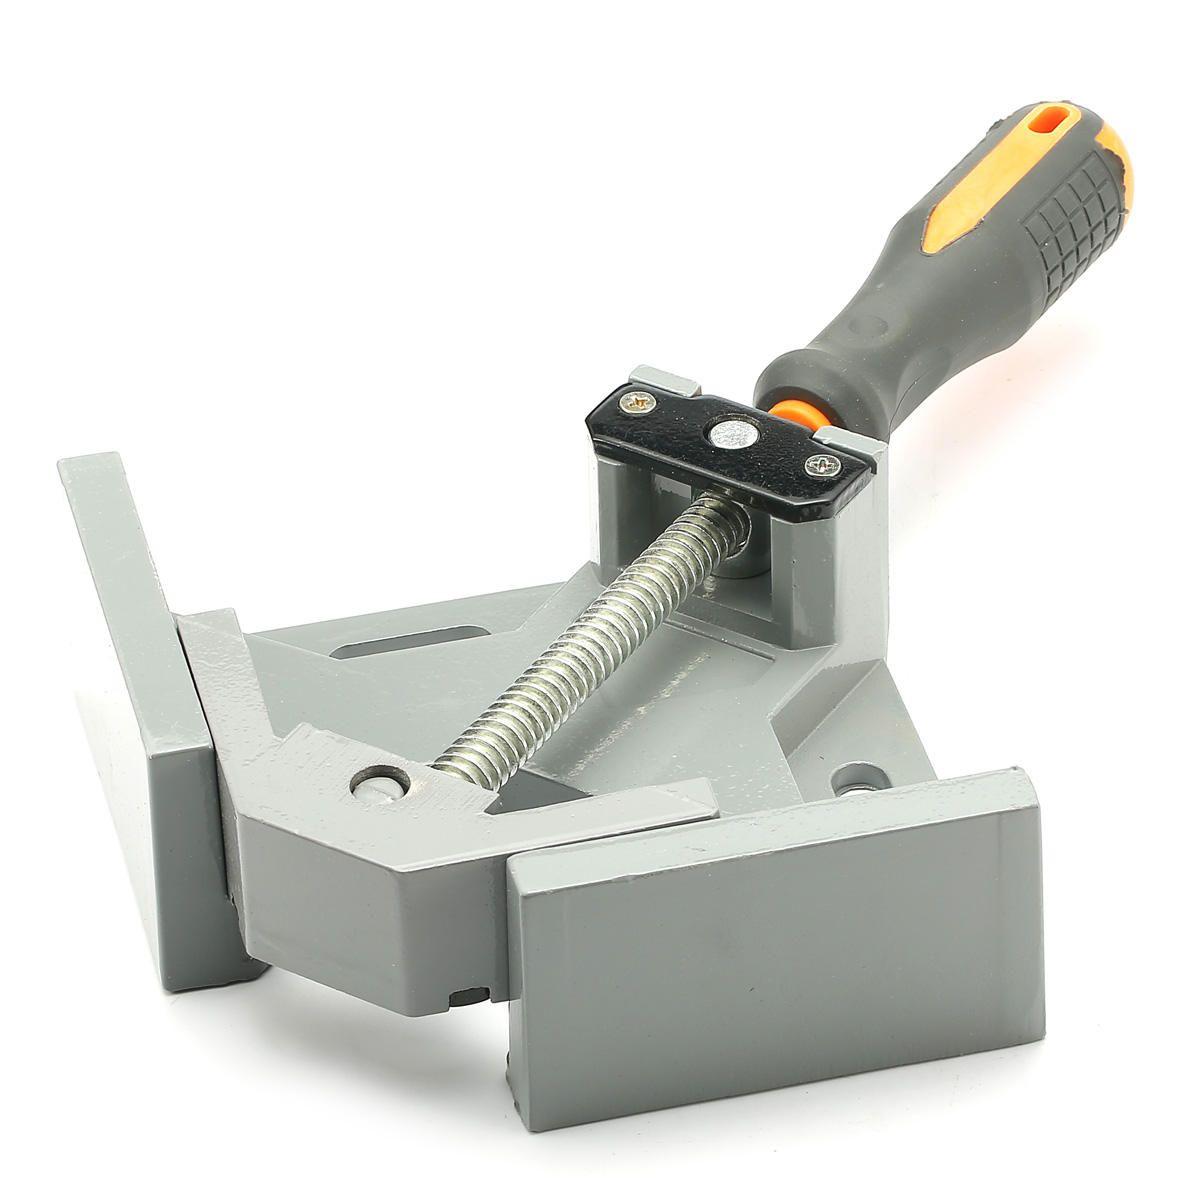 Raitool™ 90 Degree Corner Tool Right Angle Vice Welding Wood Working Clamps